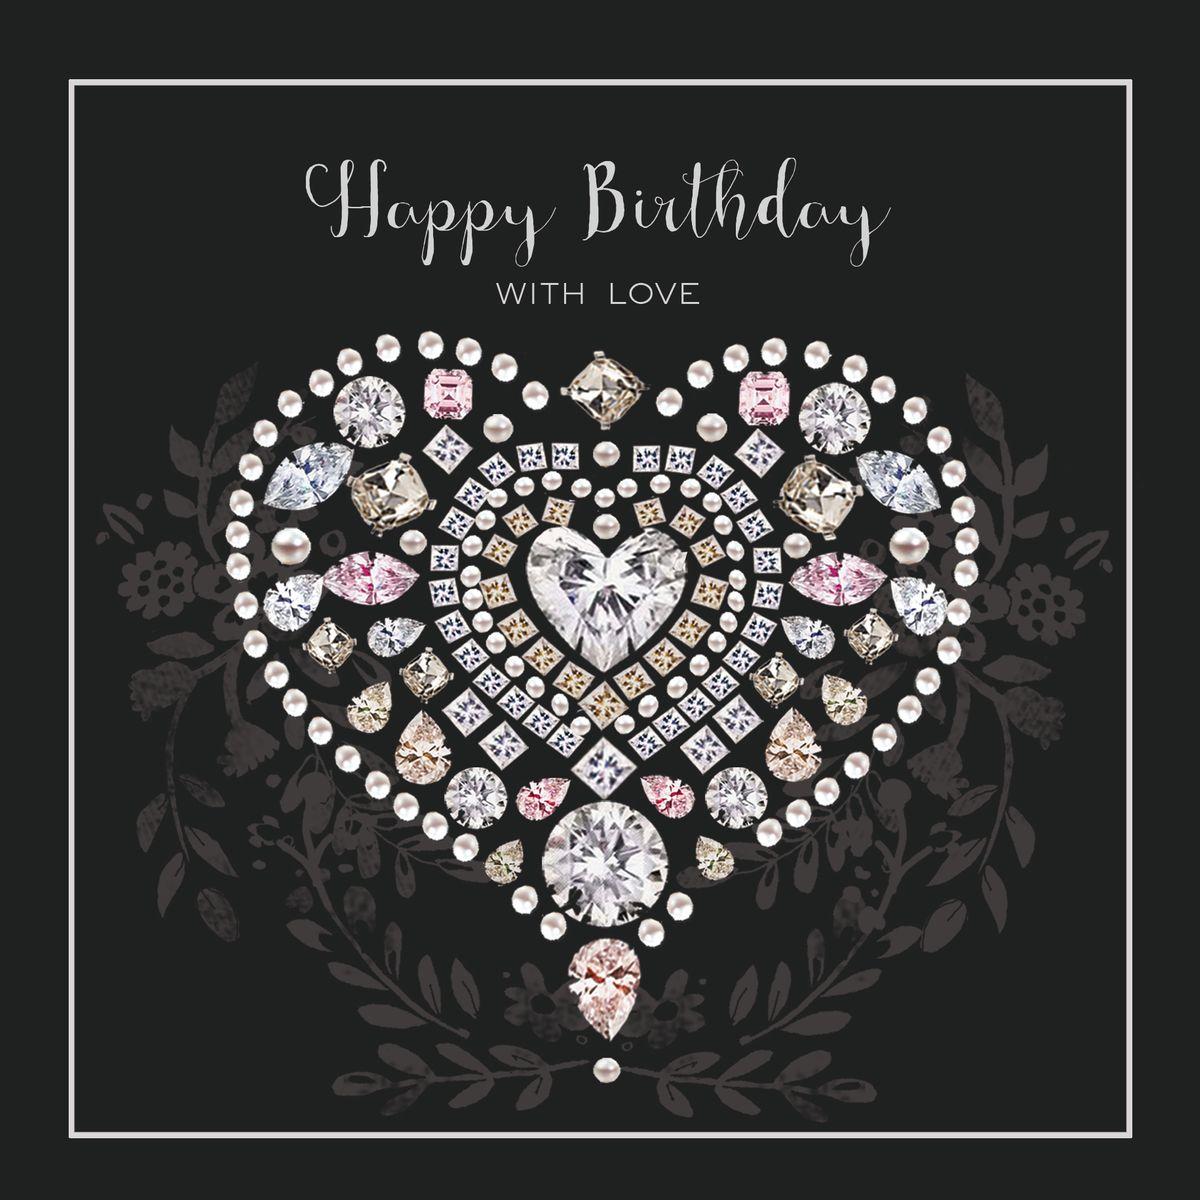 Geburtstag Karte Grußkarte Silber Prägedruck Diamanten Herz 16x16cm